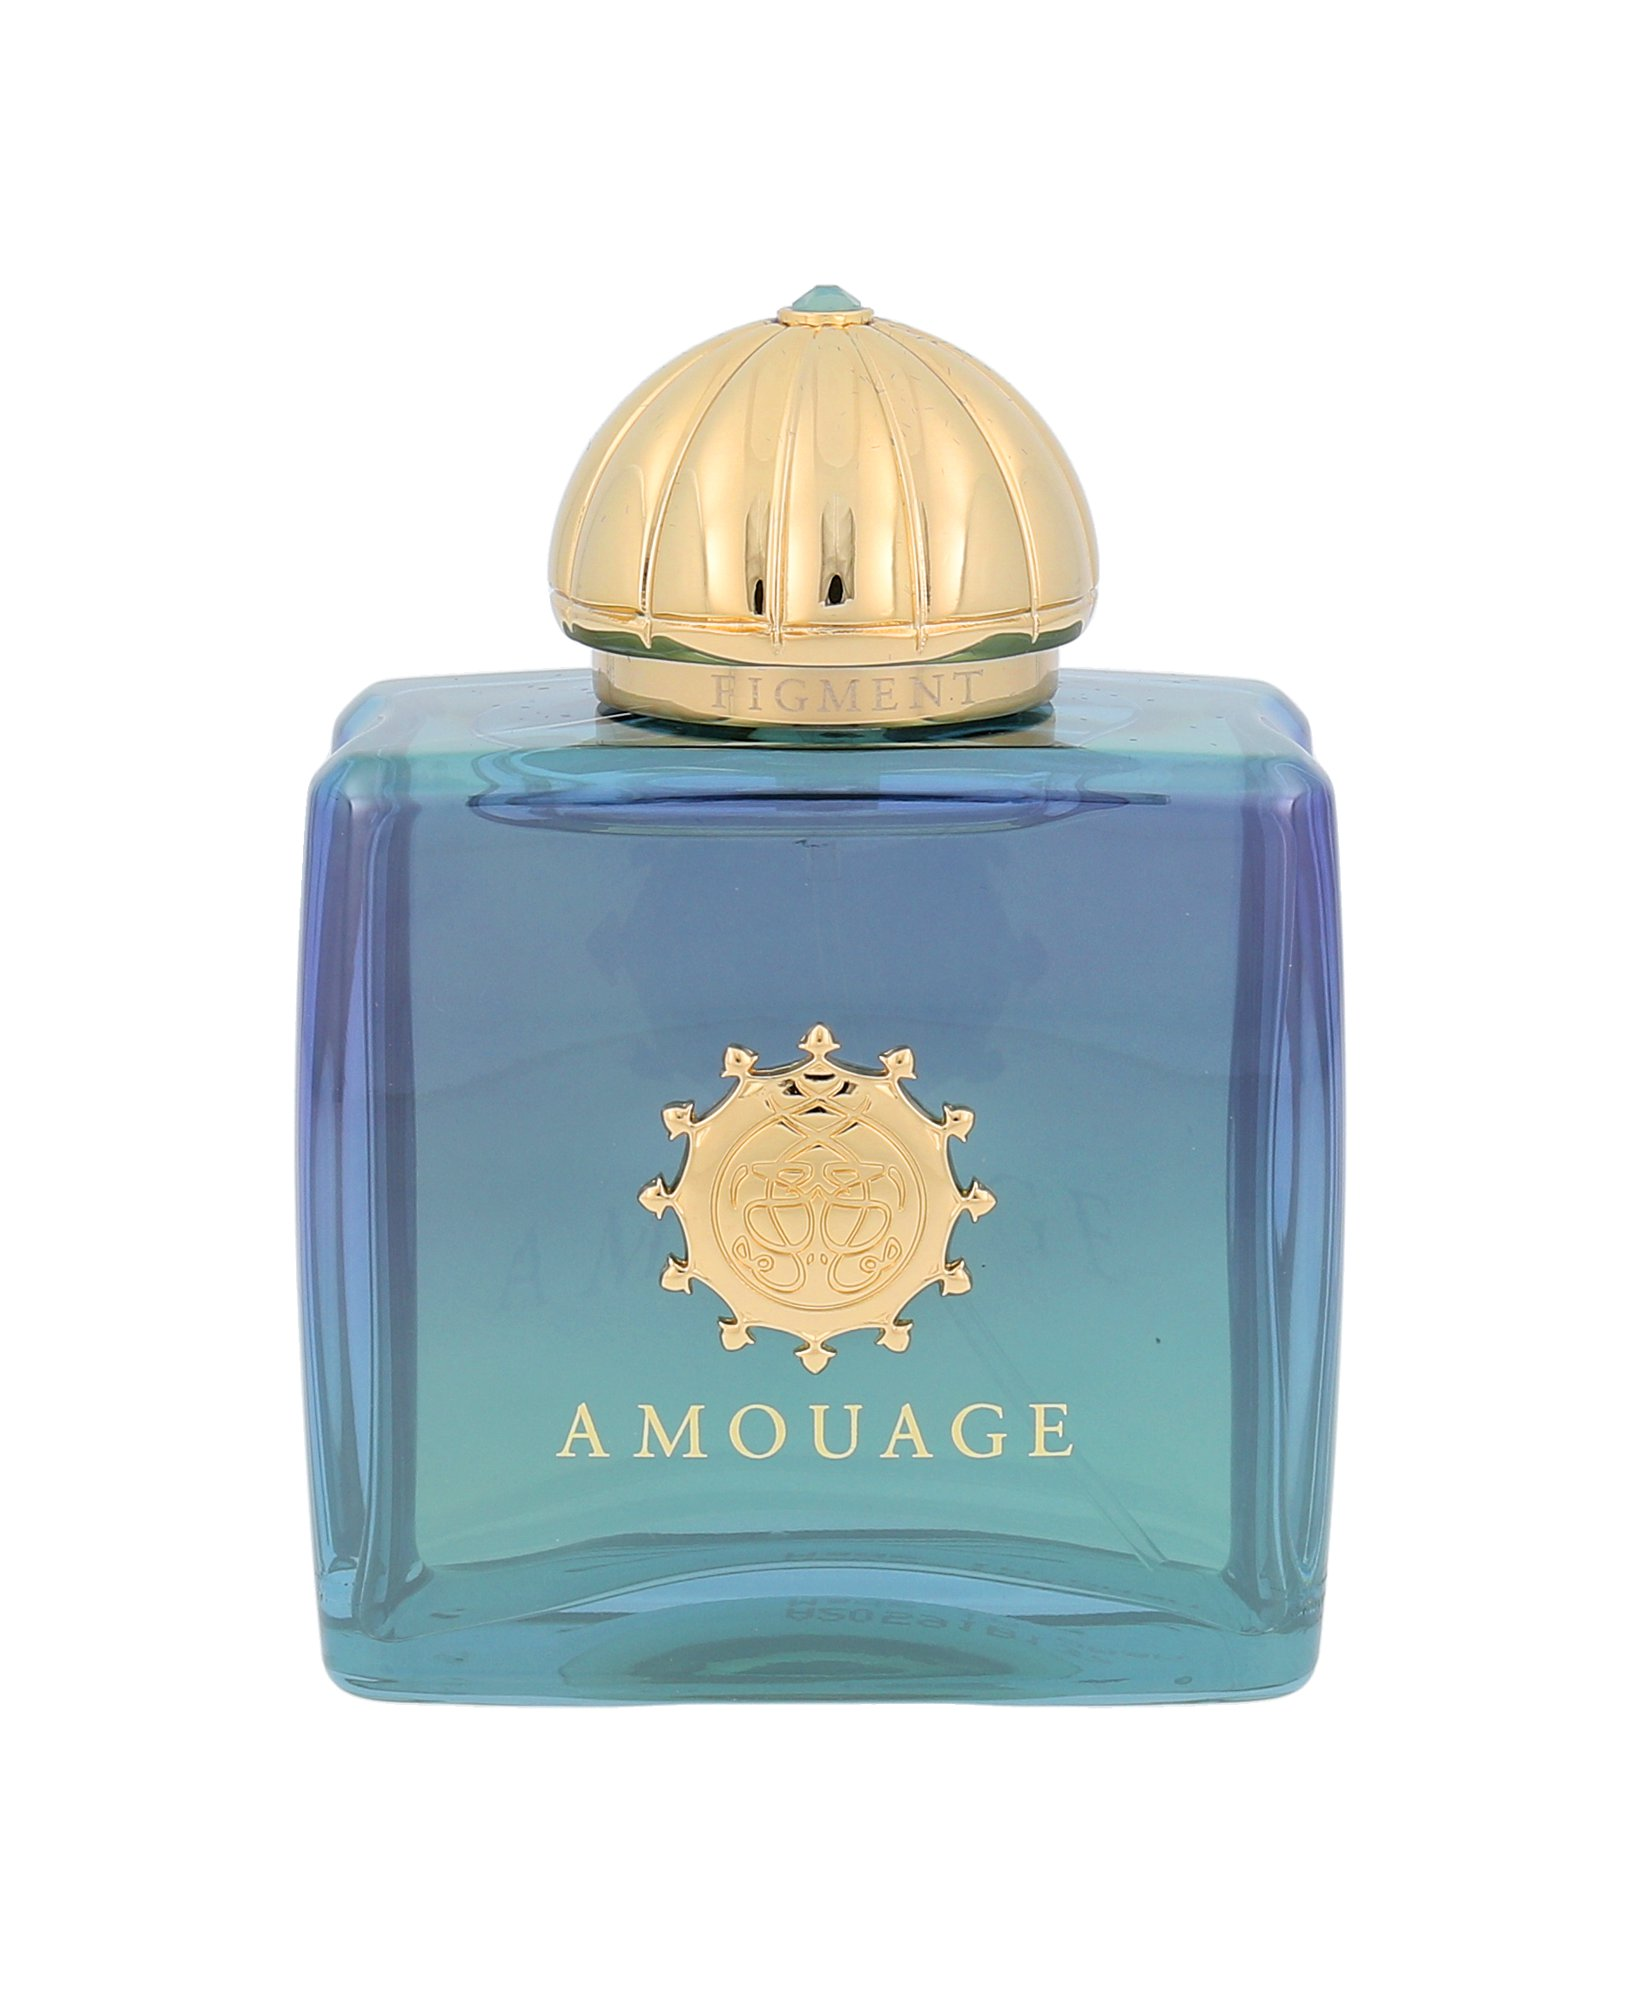 Amouage Figment, edp 100ml